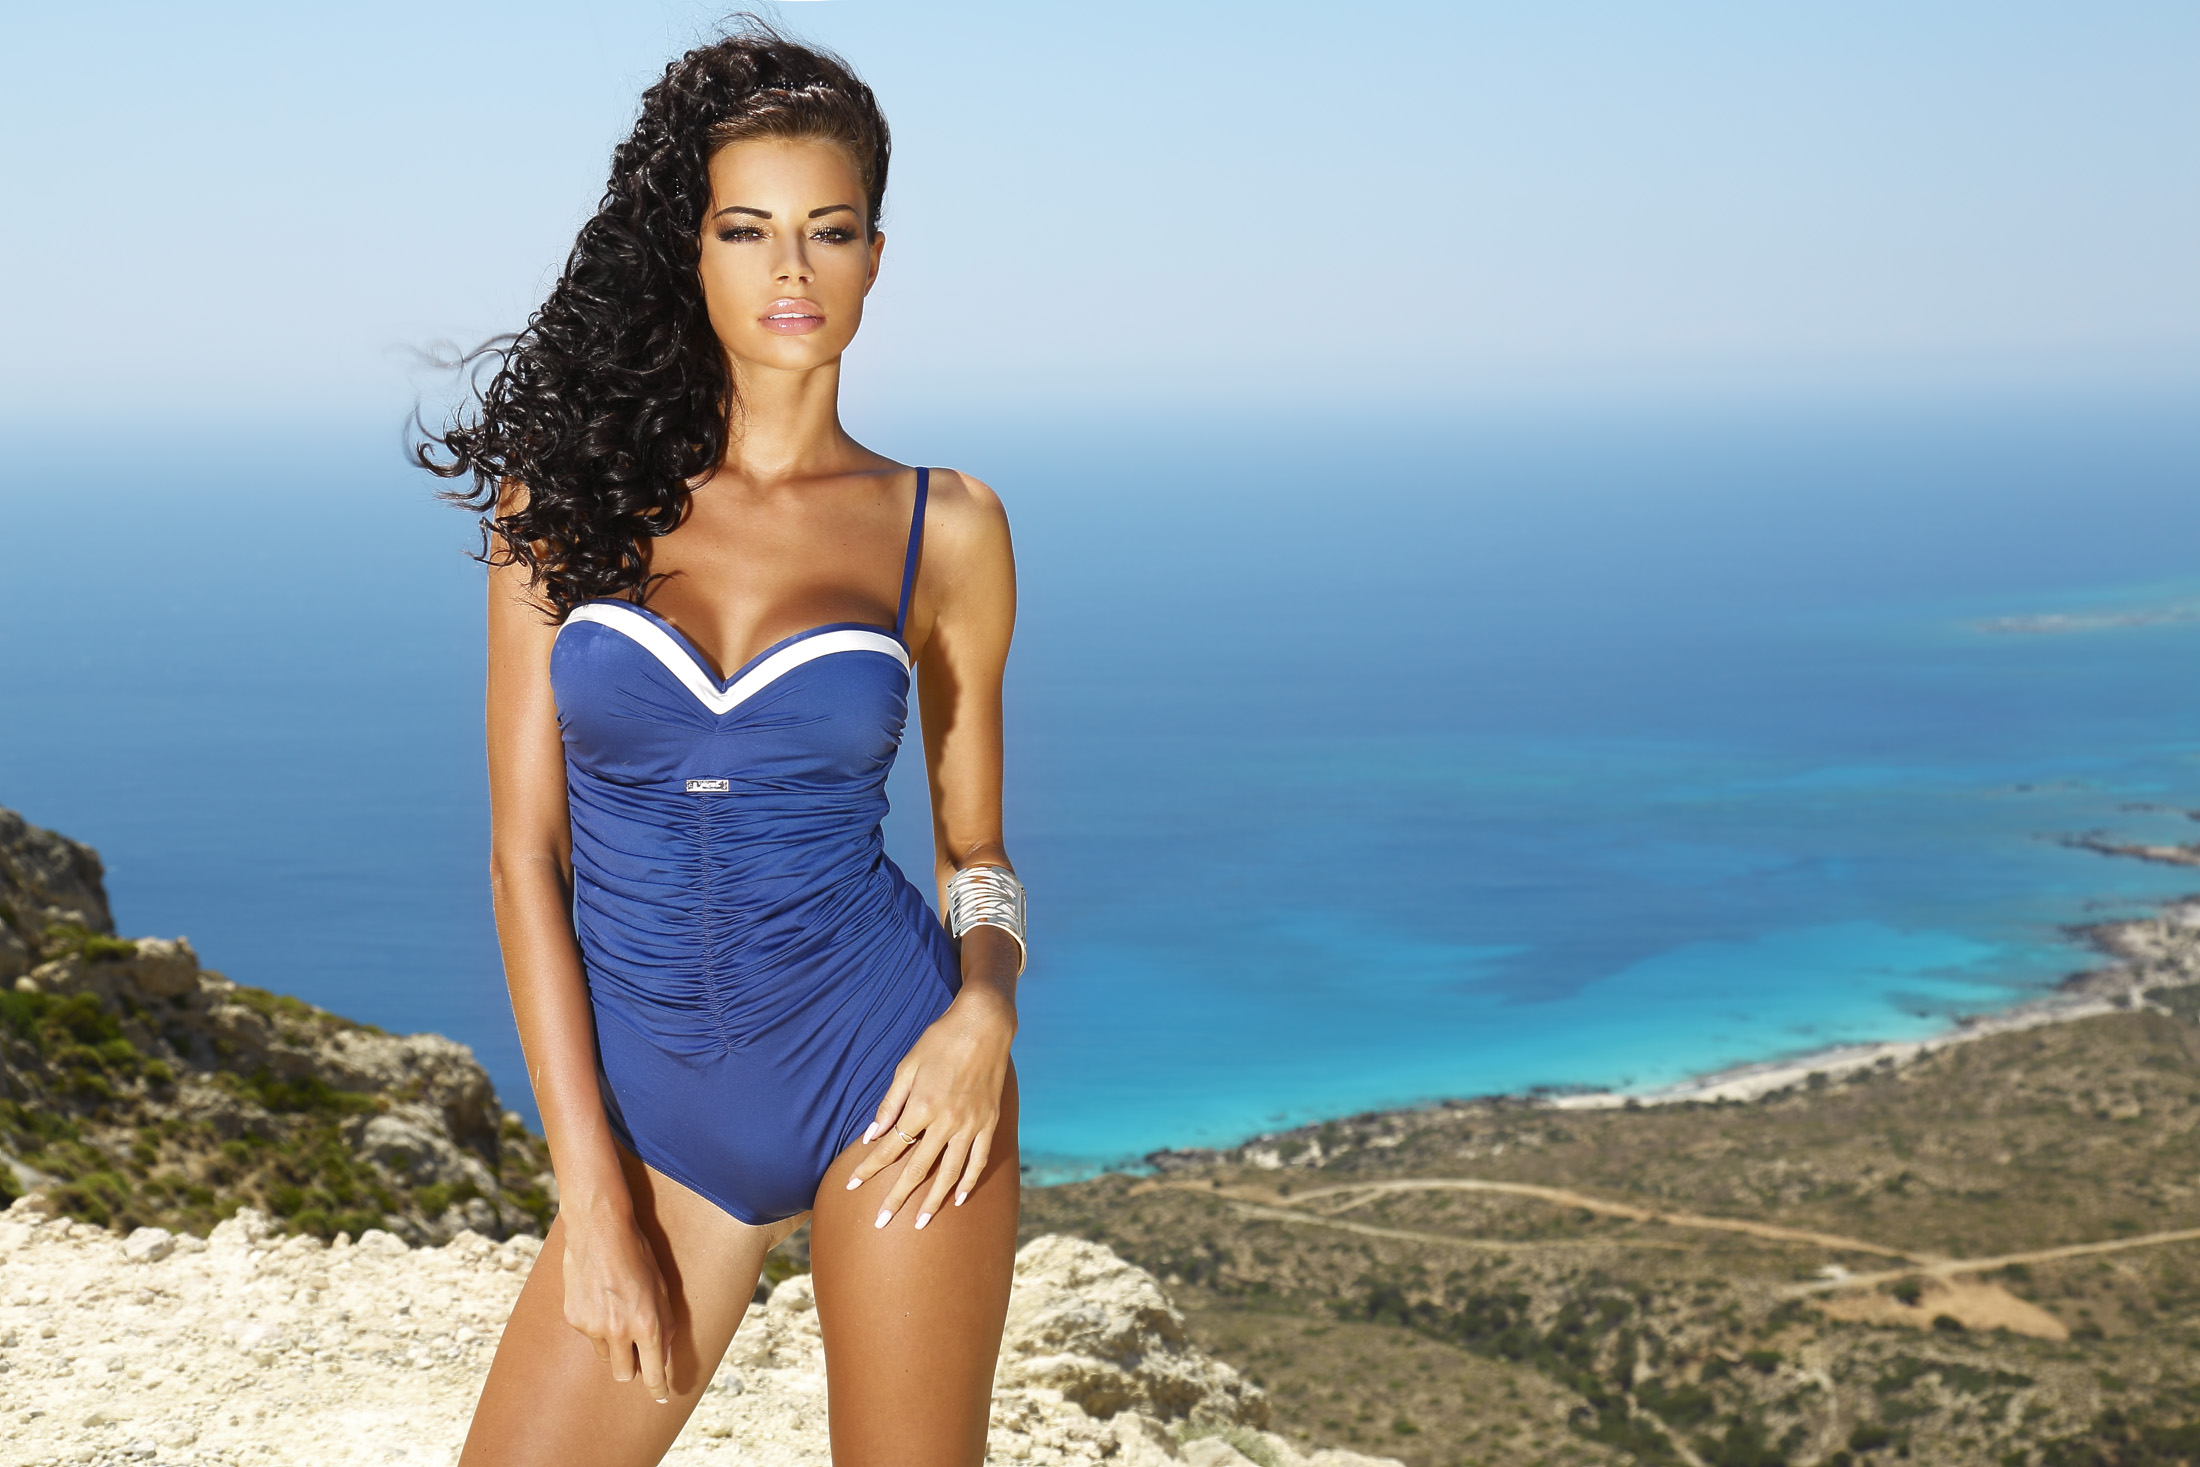 kostiumy kąpielowe Lavel - Anastazja Maltese